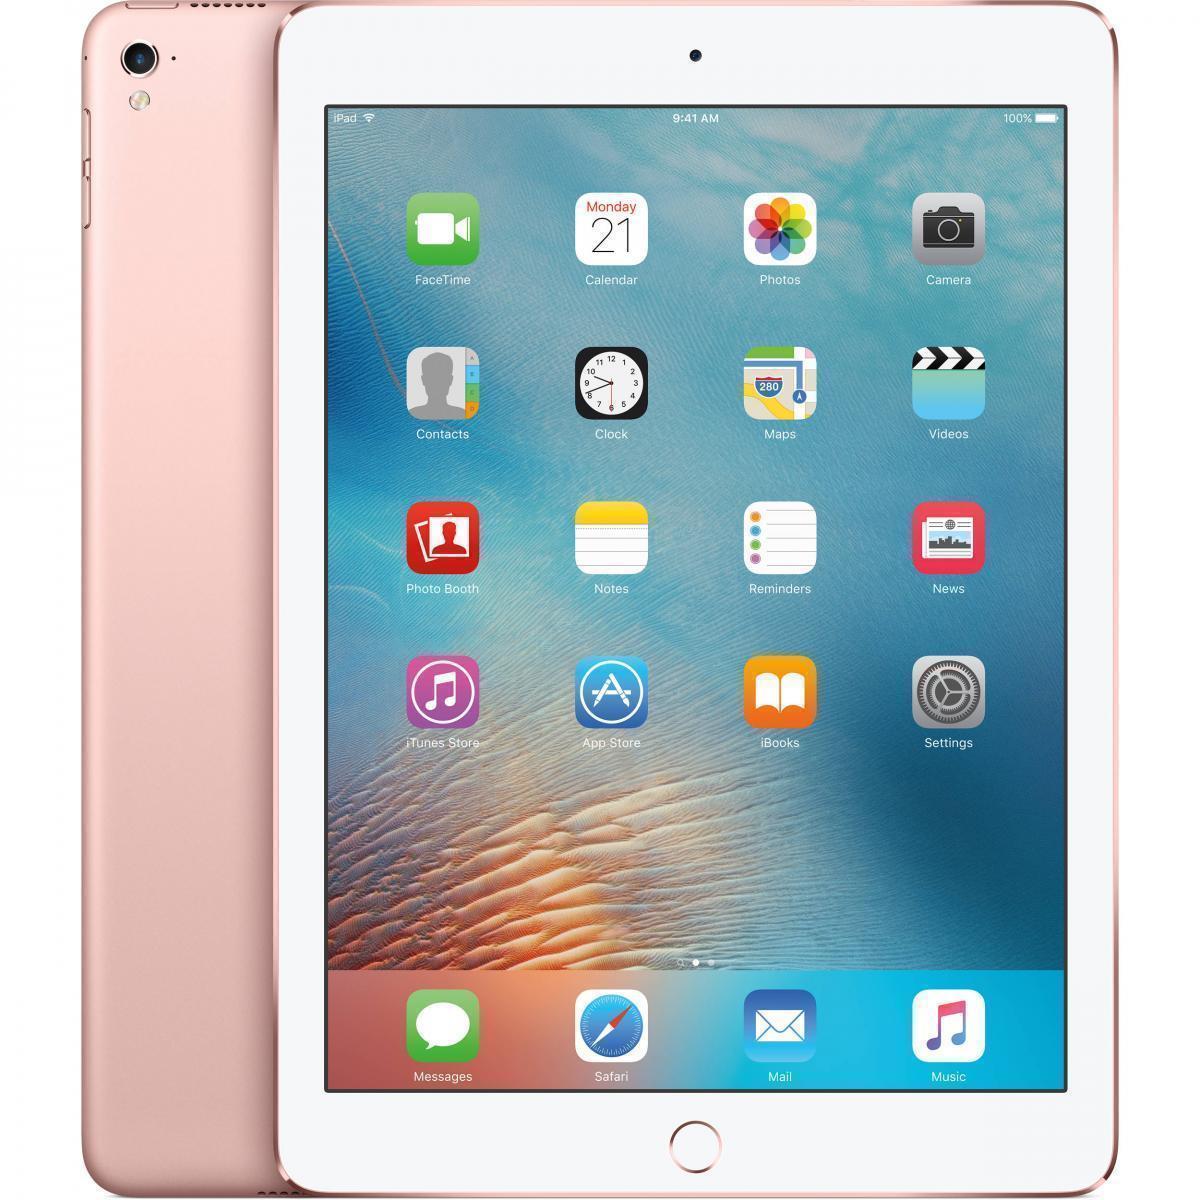 Apple iPad Pro 9.7 256Gb Wi-Fi Rose Gold iPad Pro<br>Планшет Apple iPad Pro 9.7 256Gb Wi-Fi Rose Gold<br>